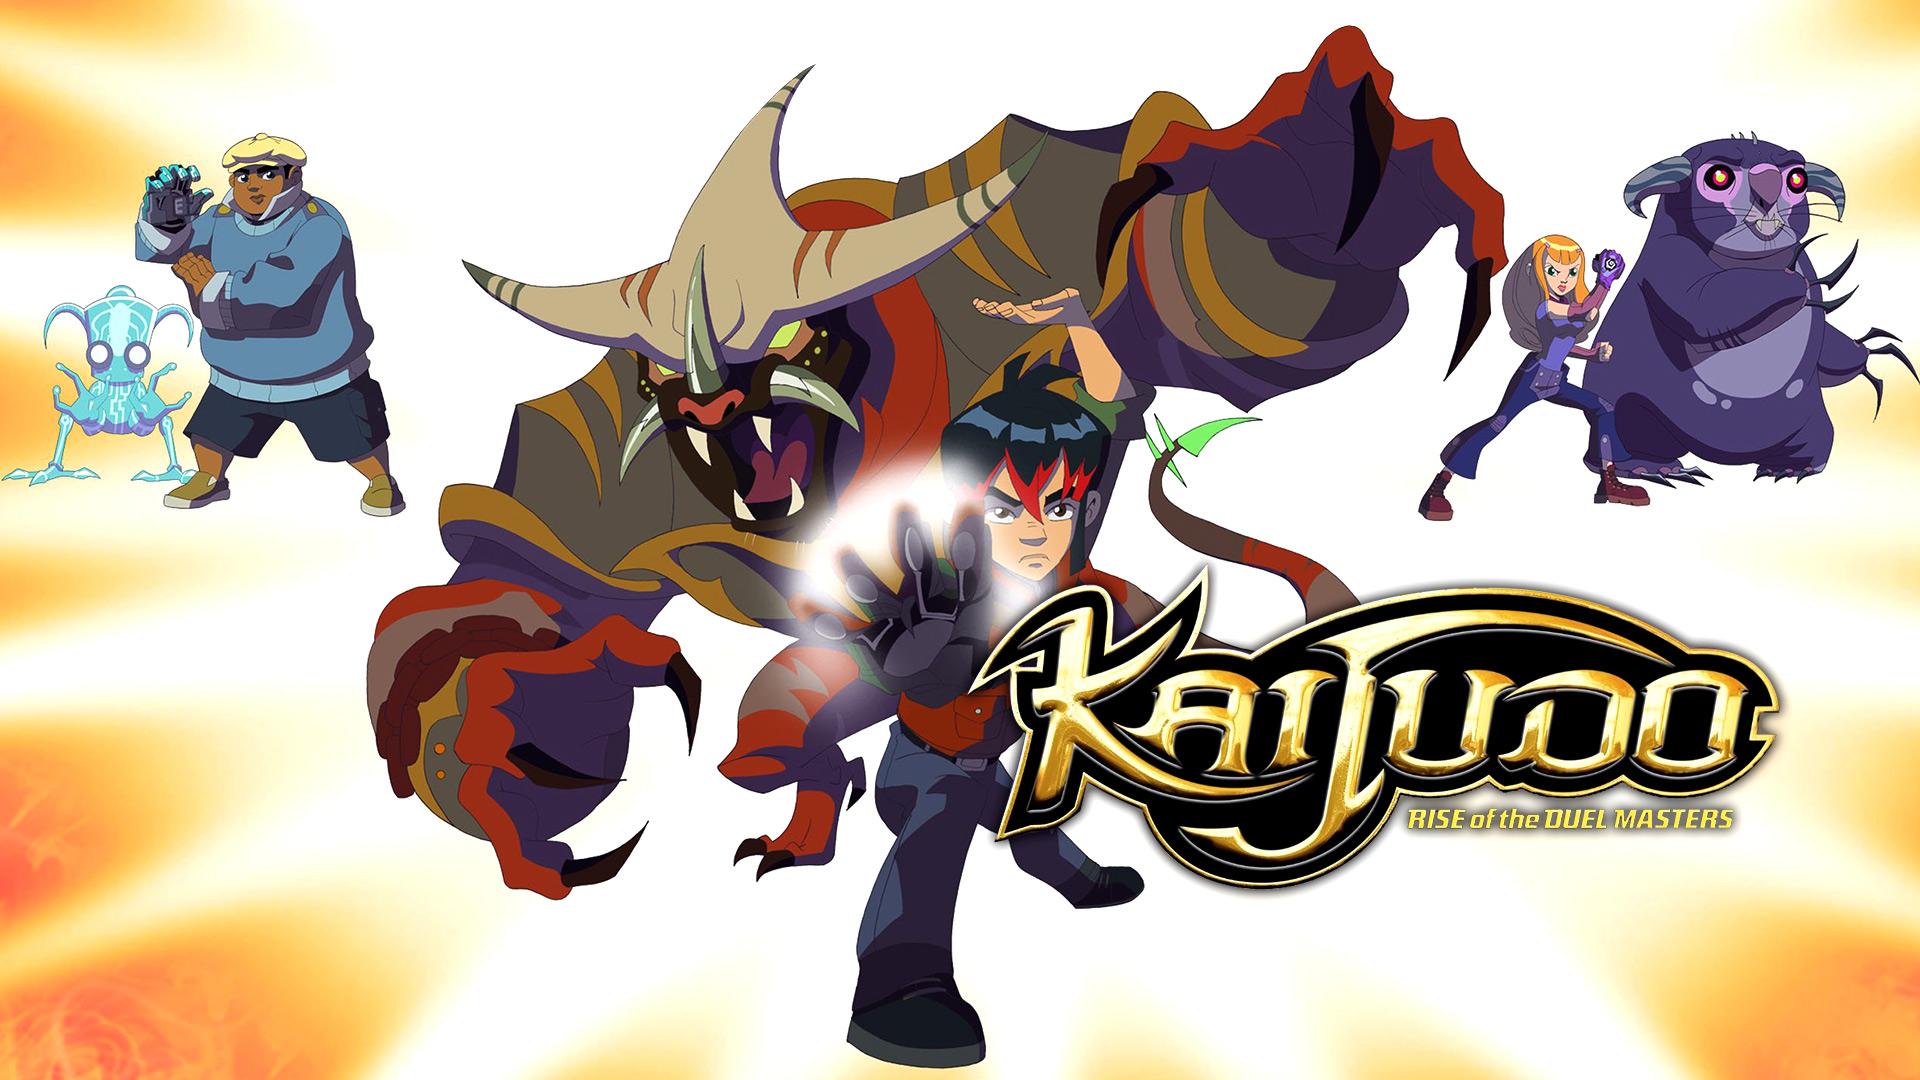 Kaijudo: Rise of The Duel Masters - Season 1